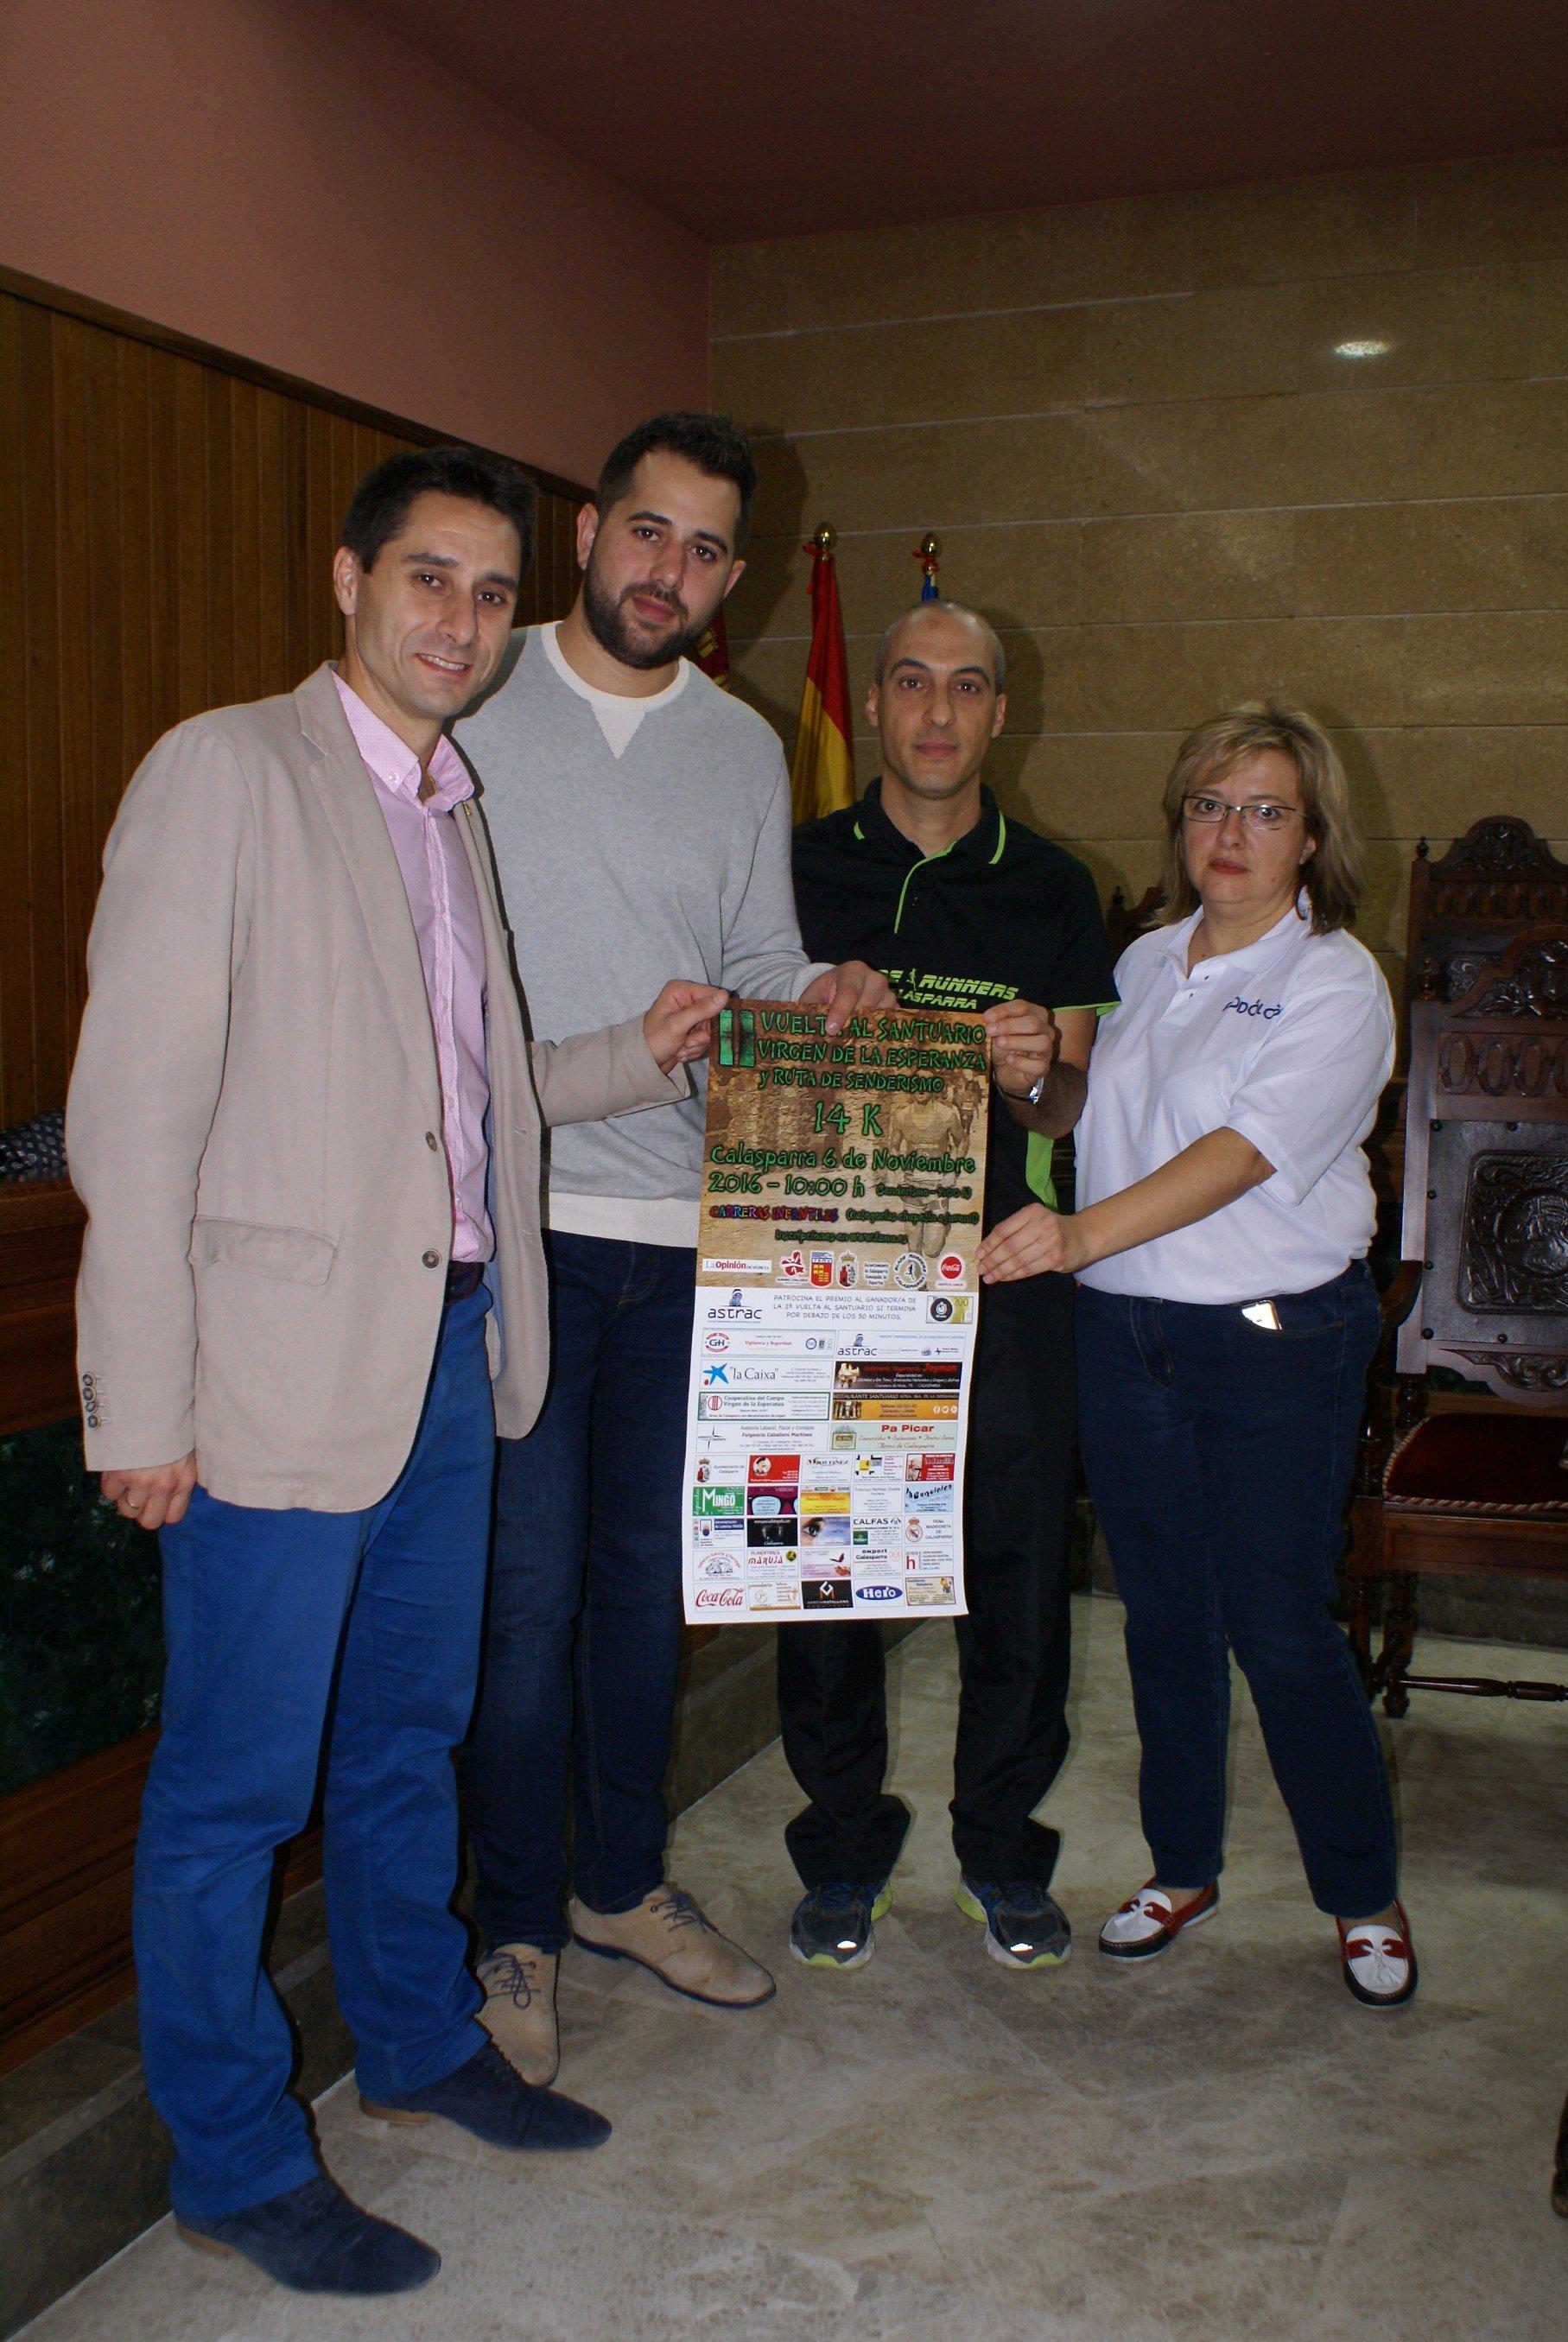 Presentación Oficial 2ª Vuelta Al Santuario